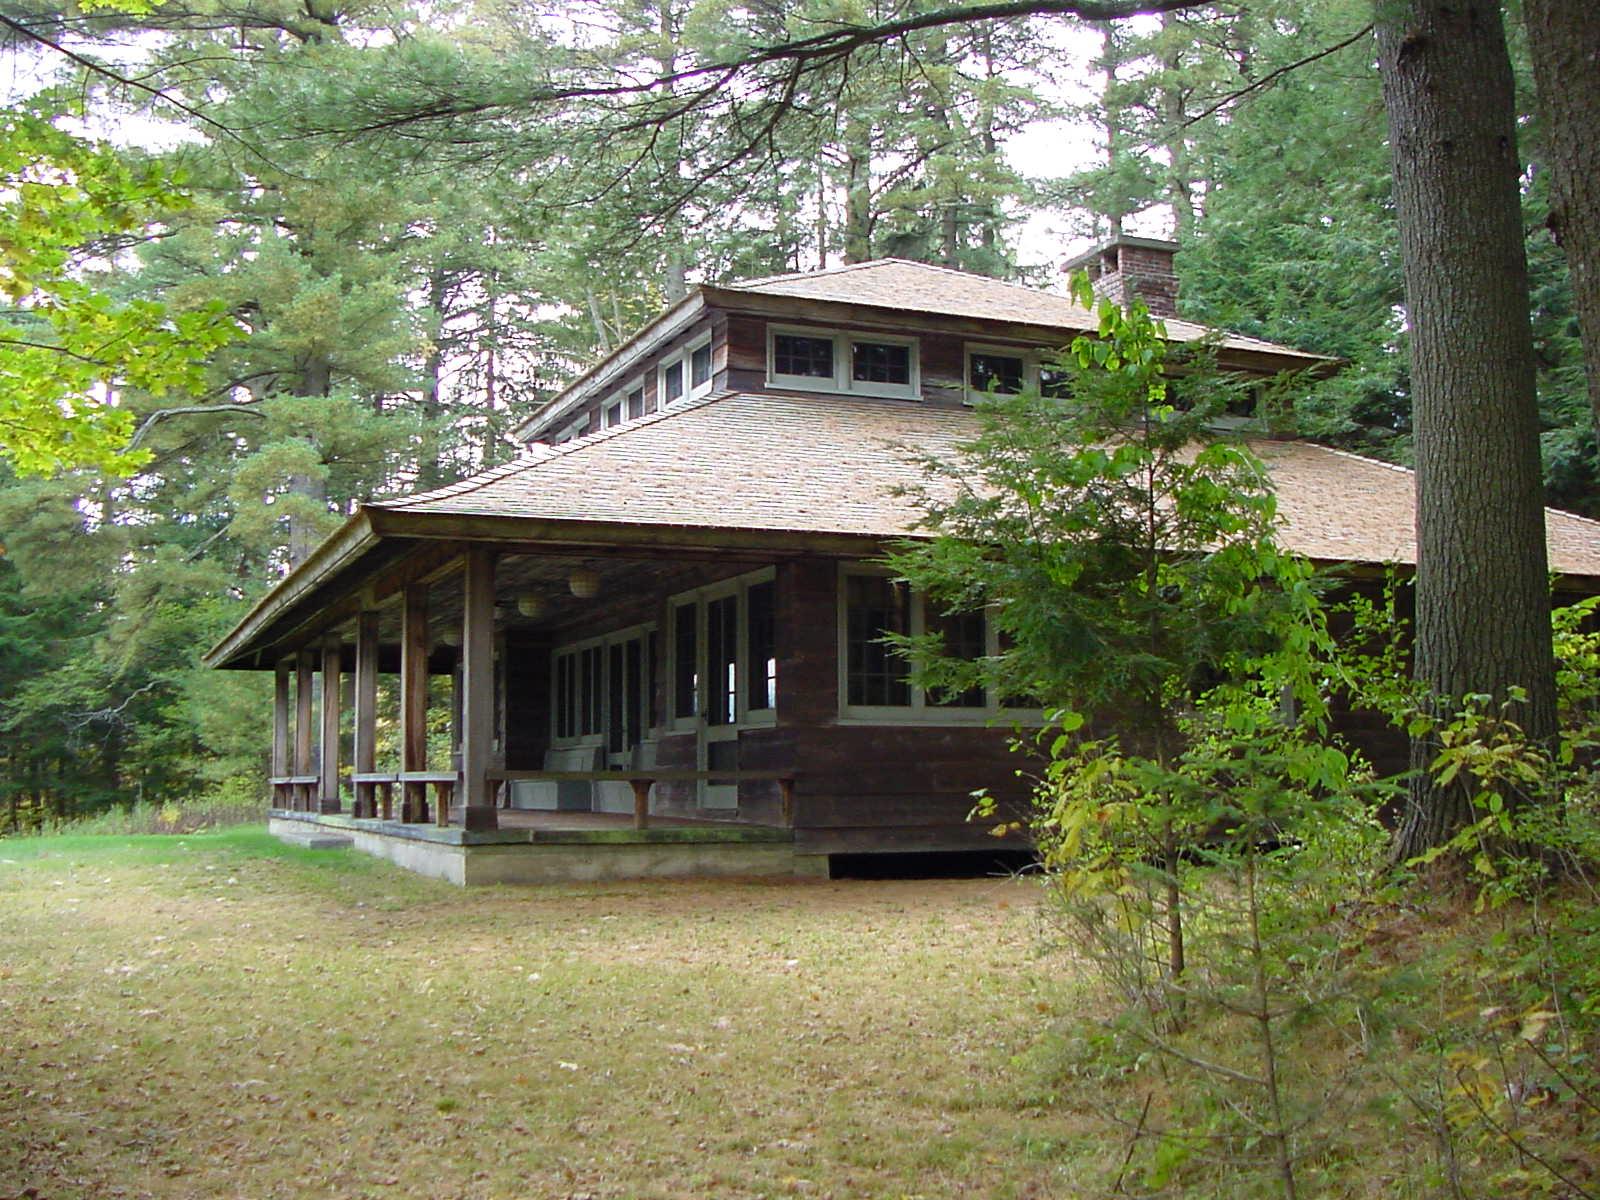 bungalow marsh billings rockefeller national historical park